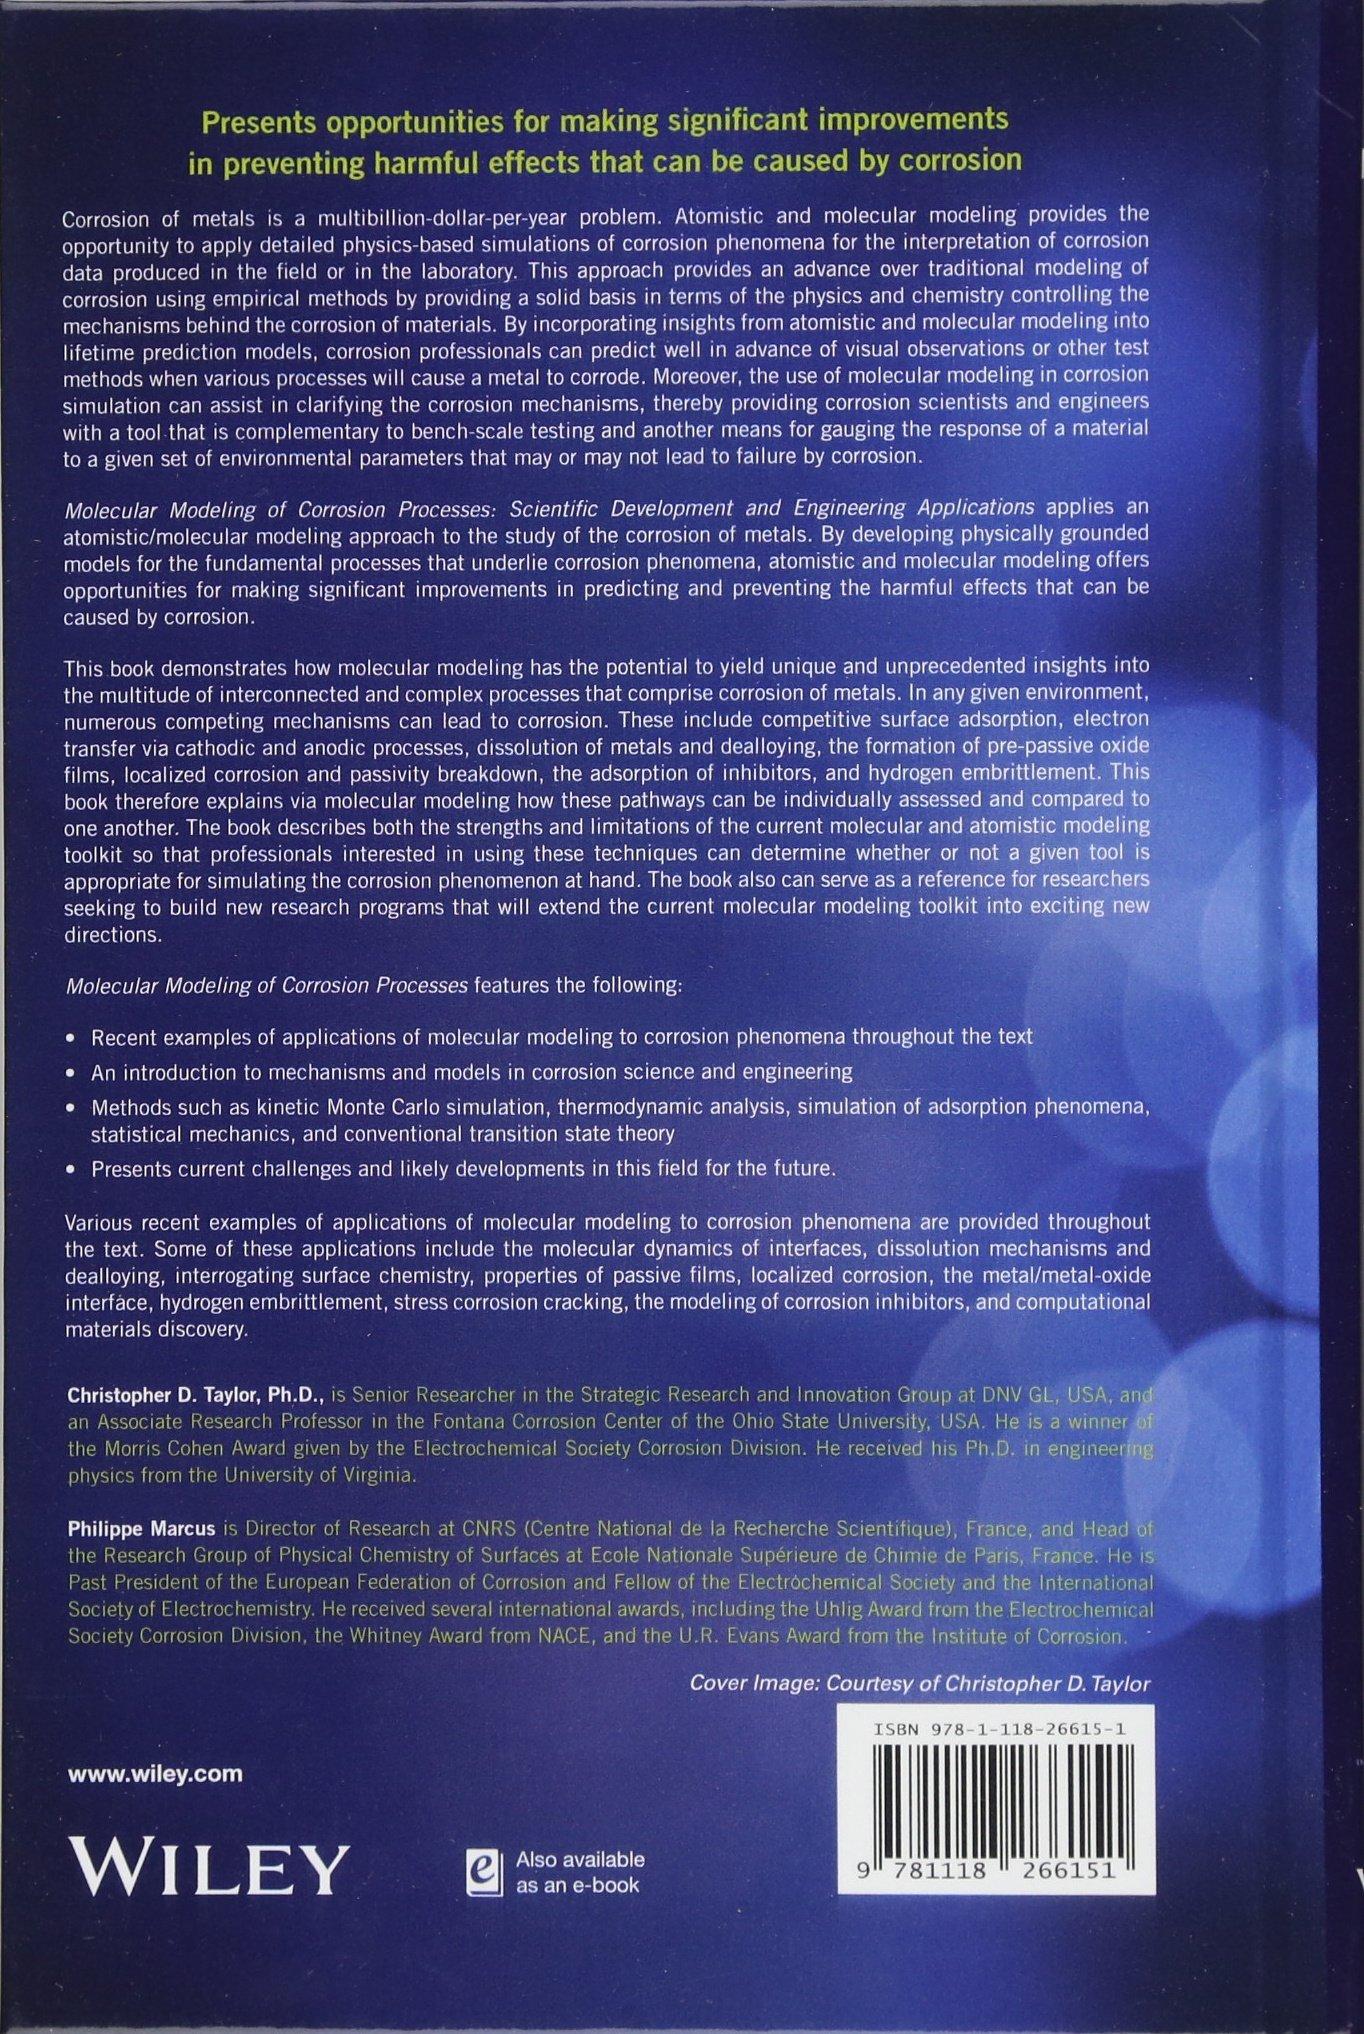 Molecular Modeling of Corrosion Processes: Scientific